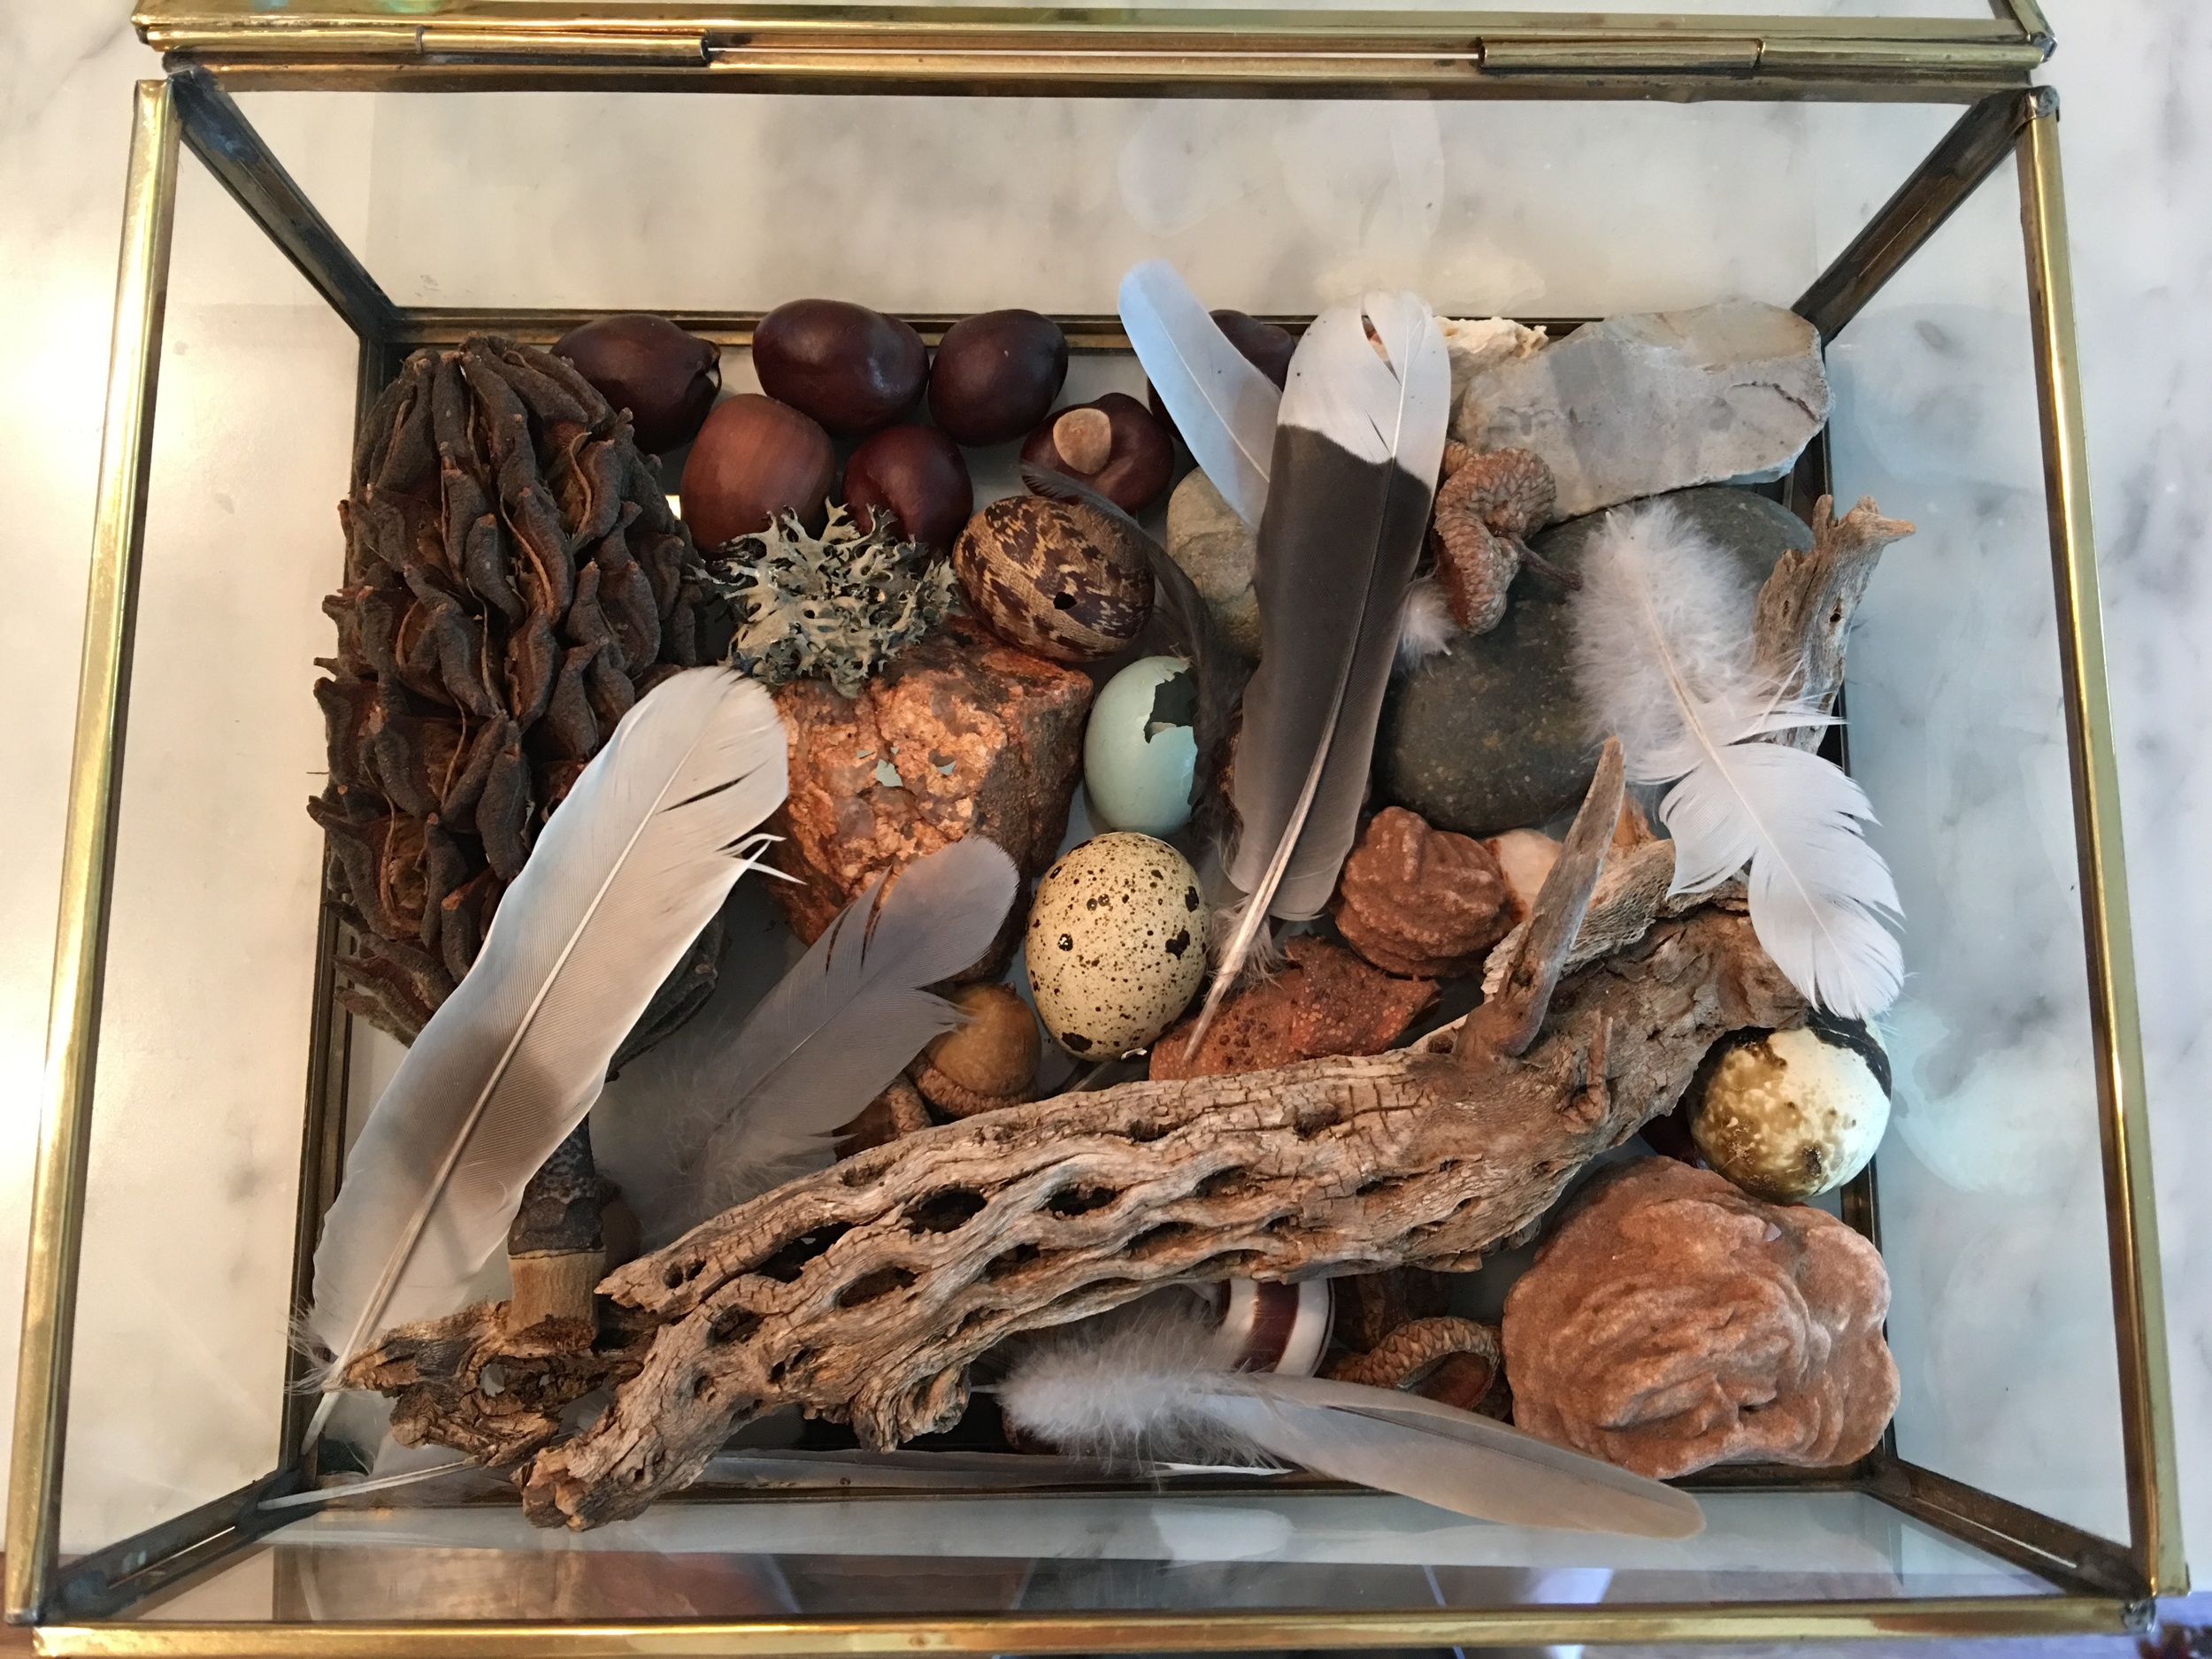 Emmett's collection